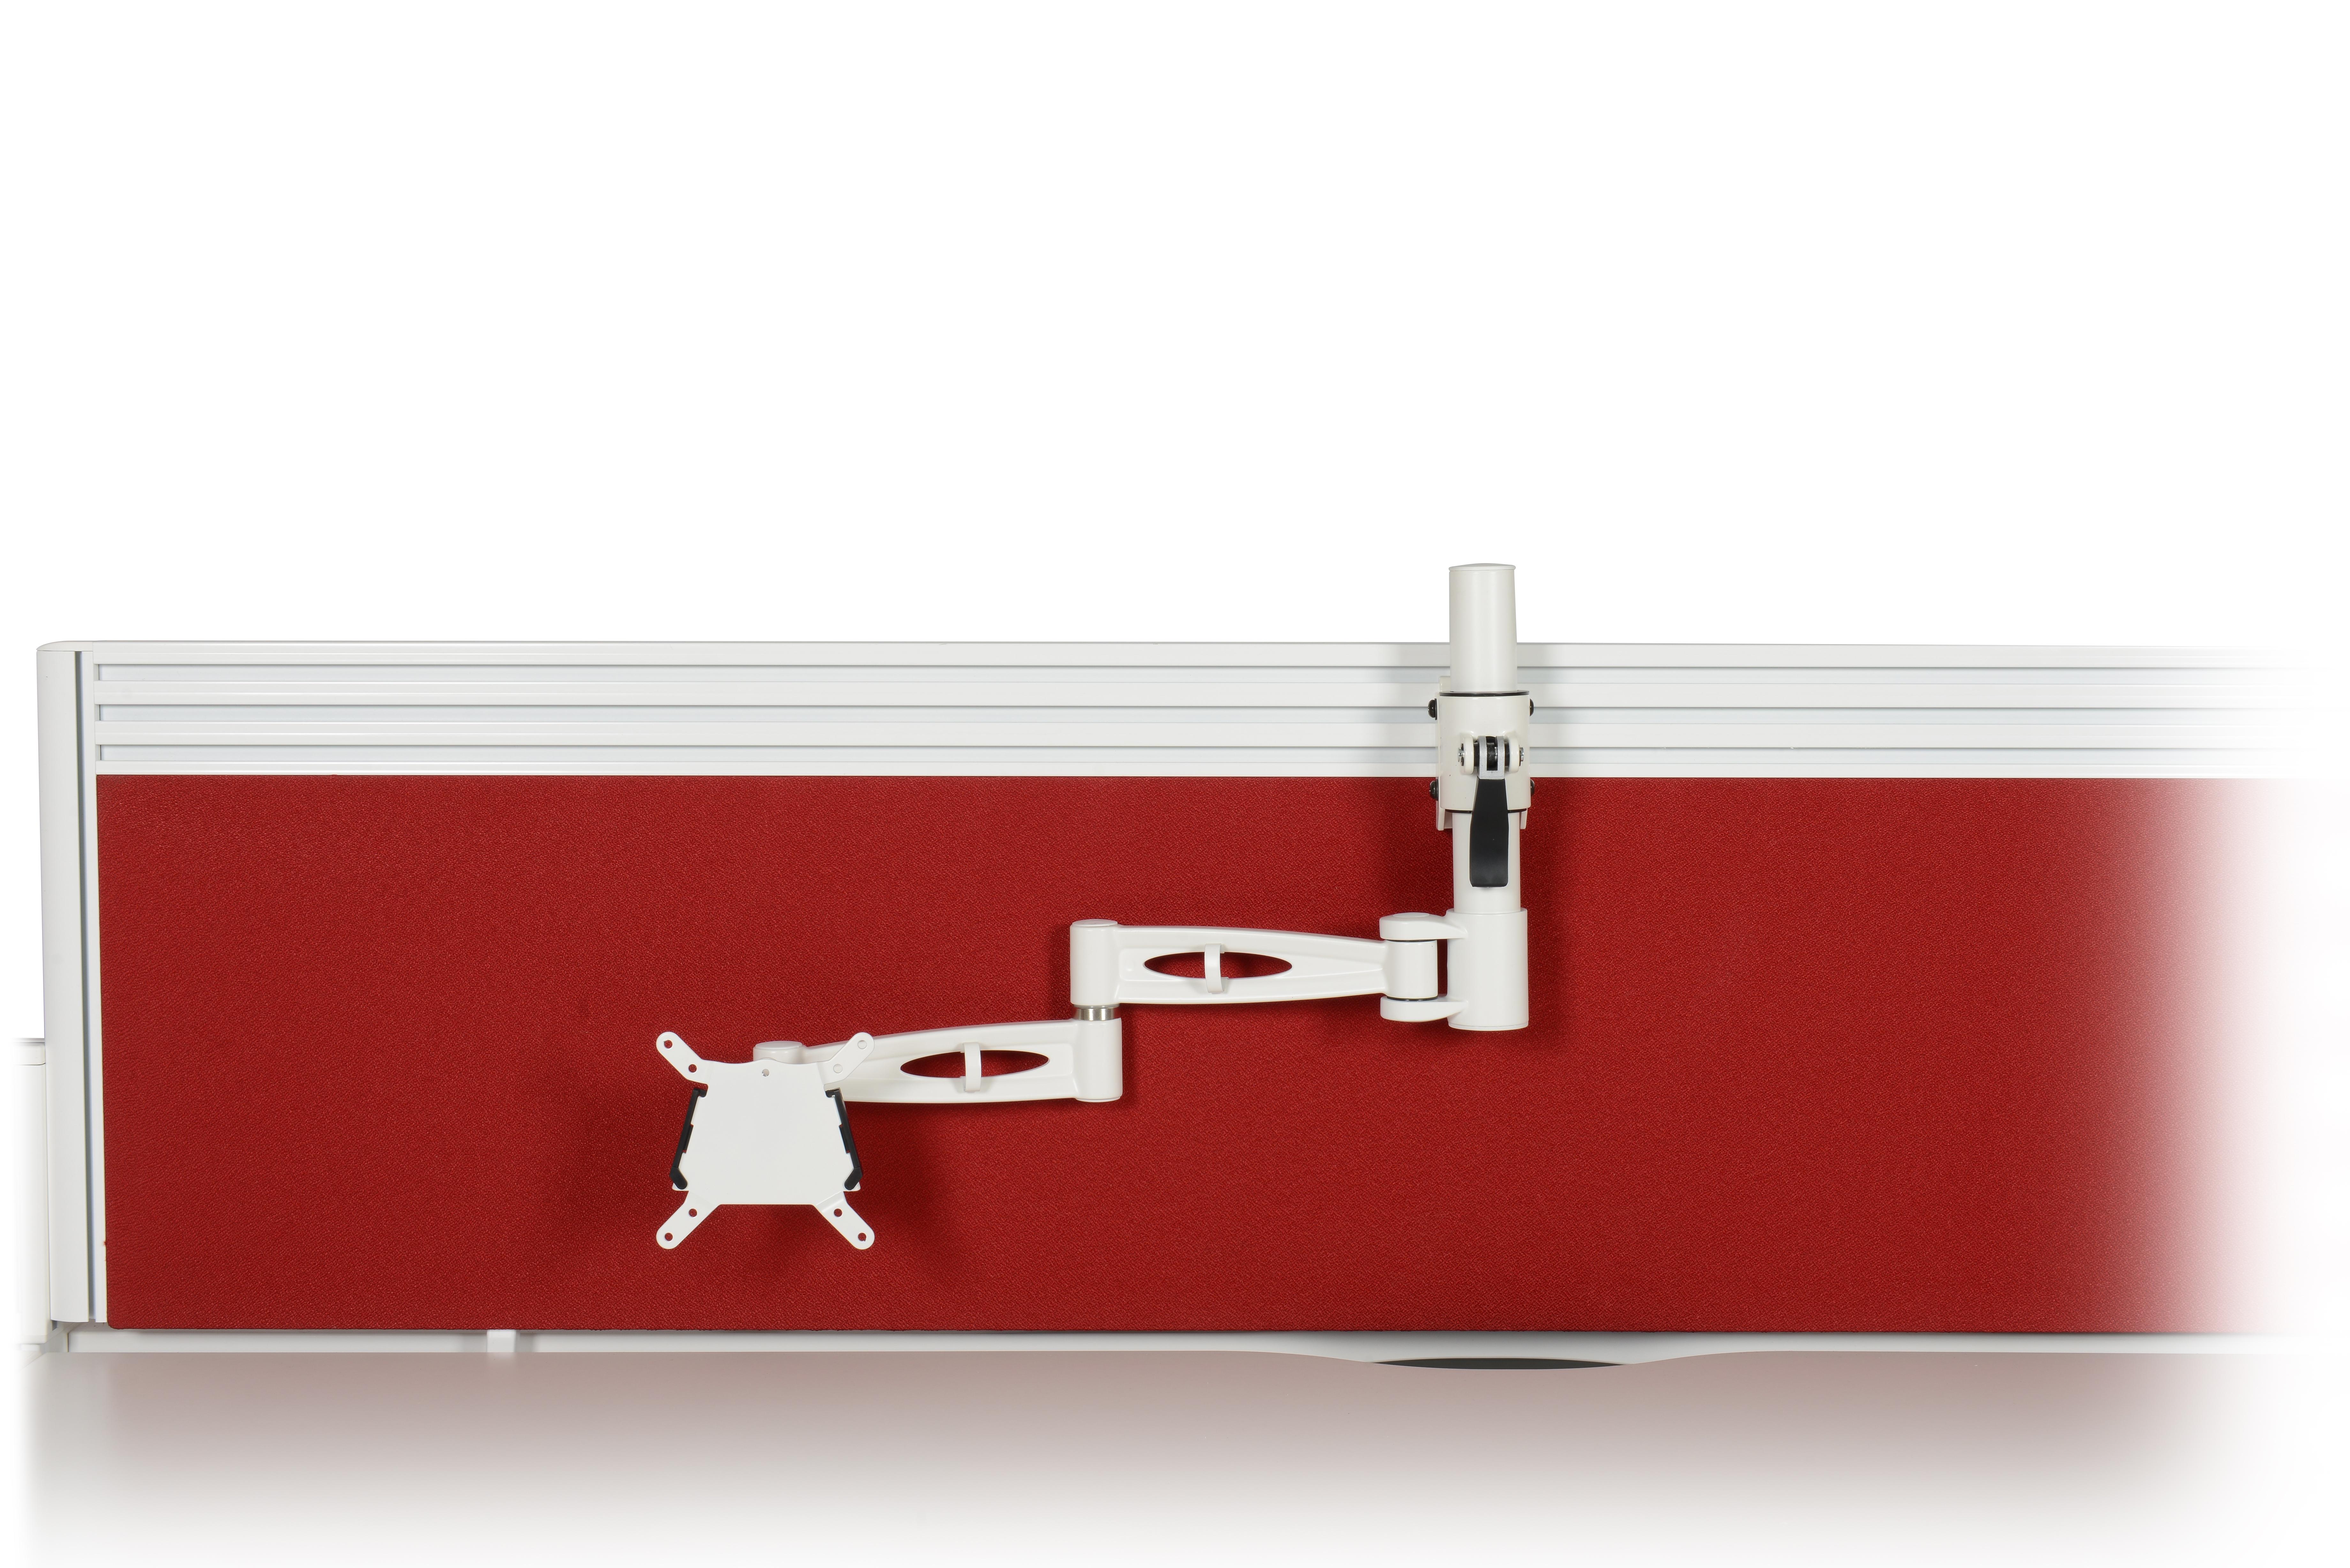 Kardo Tool Rail Mounted Pole Monitor Arm for single screen